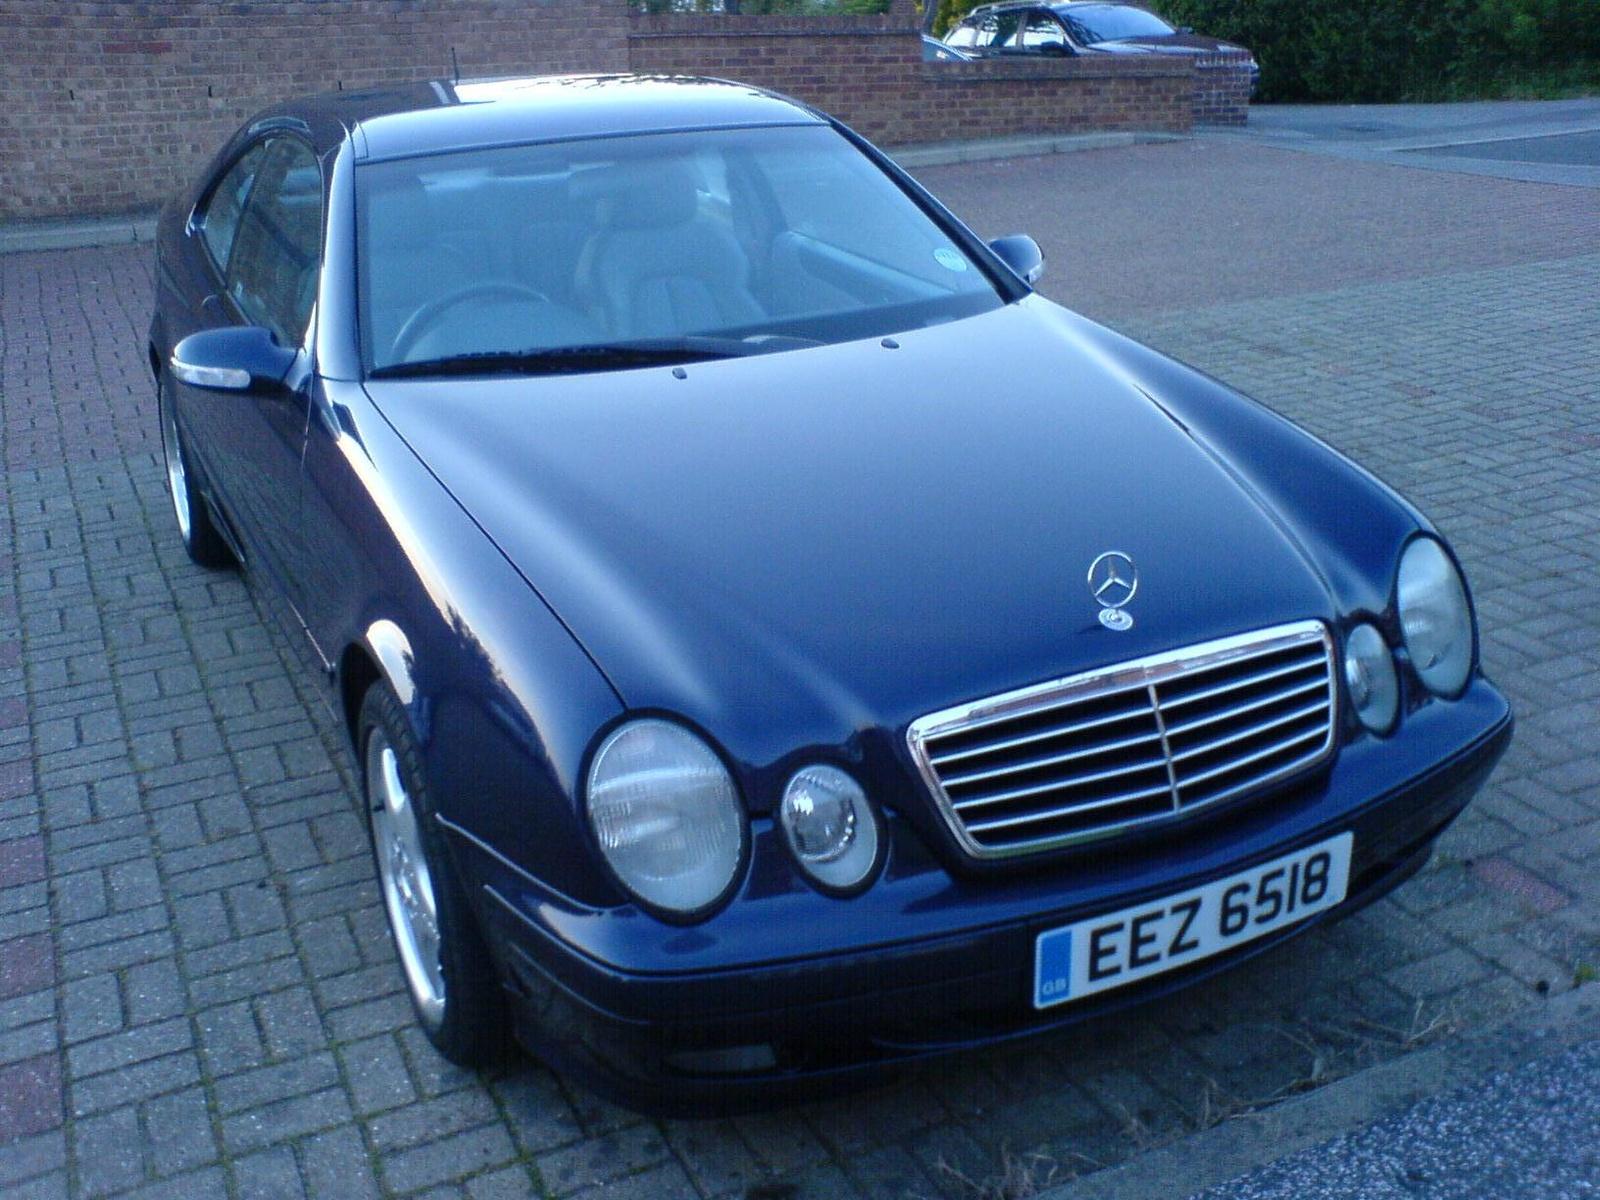 99 mercedes benz clk320 review for Mercedes benz clk320